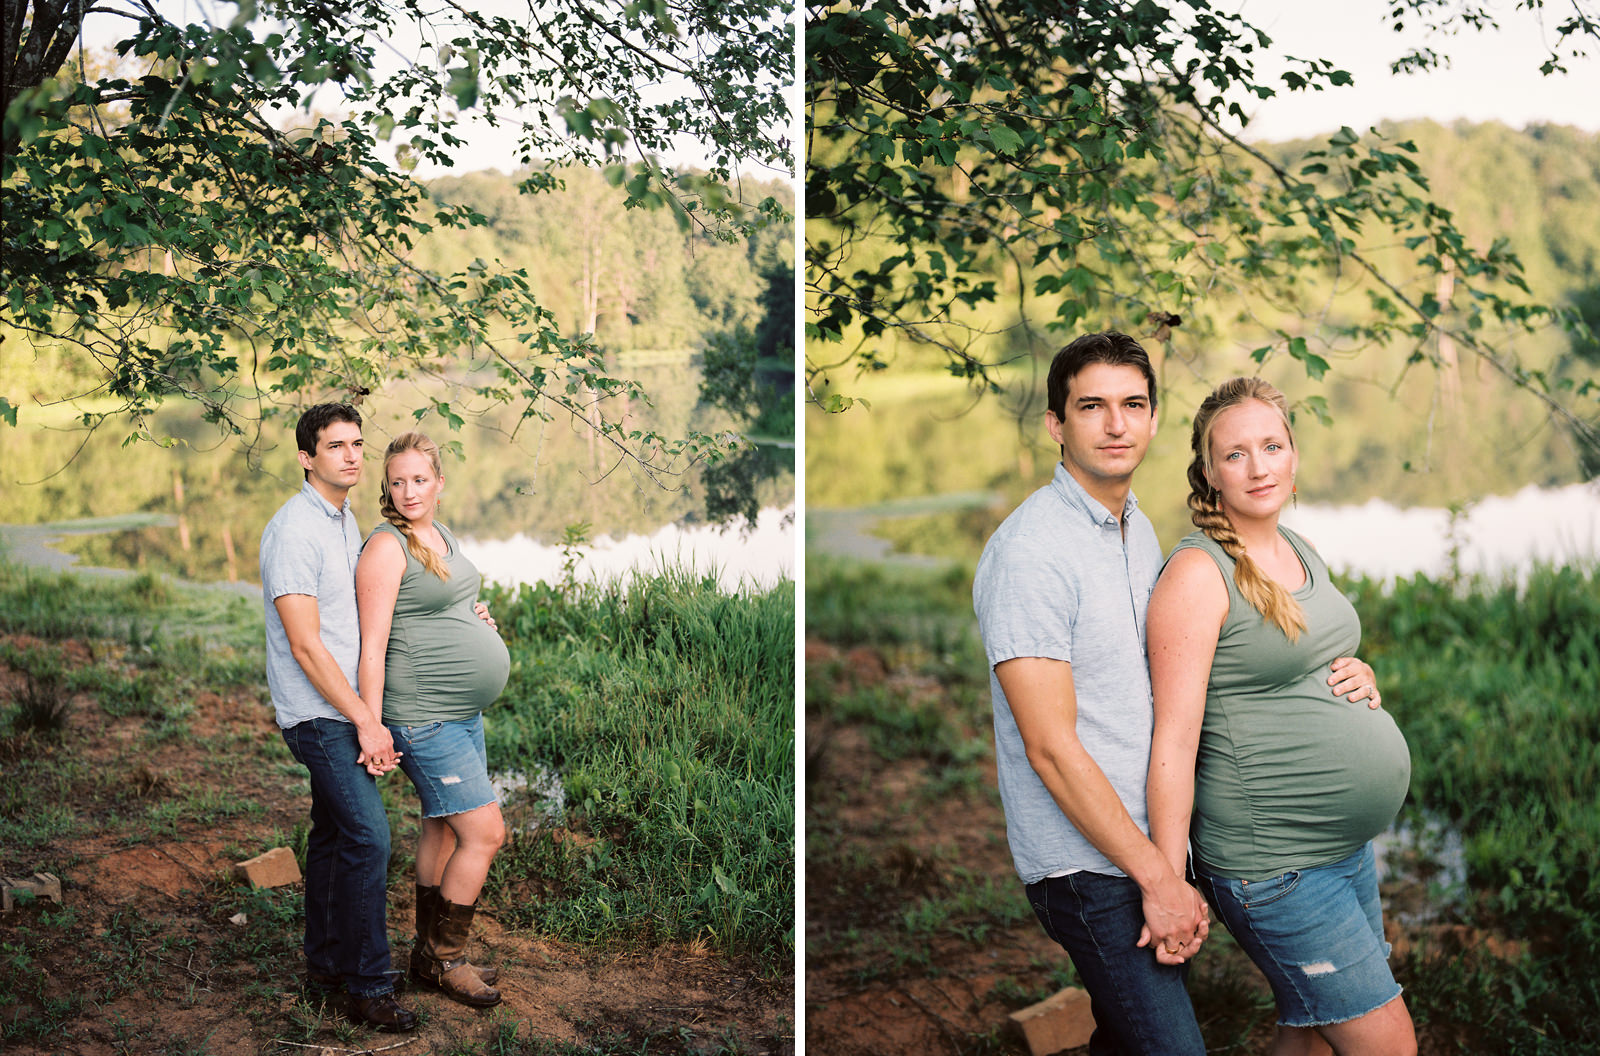 002-maternity-fine-art-film-lifestyle-photography.jpg